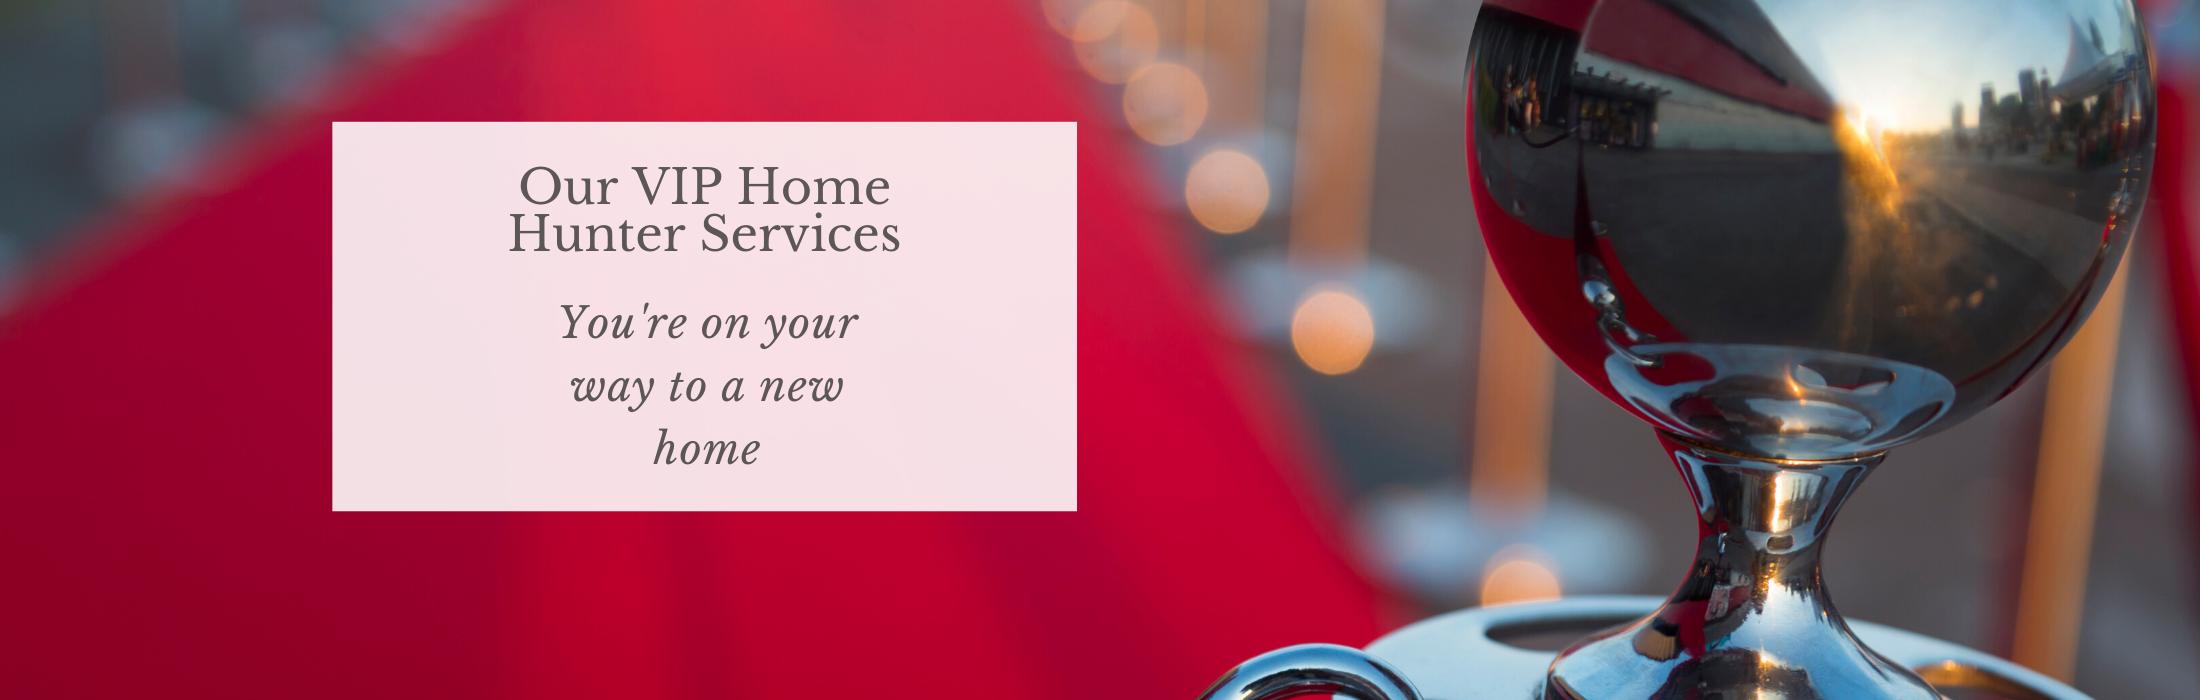 RG_VIP_access_Homes_List_(1).png